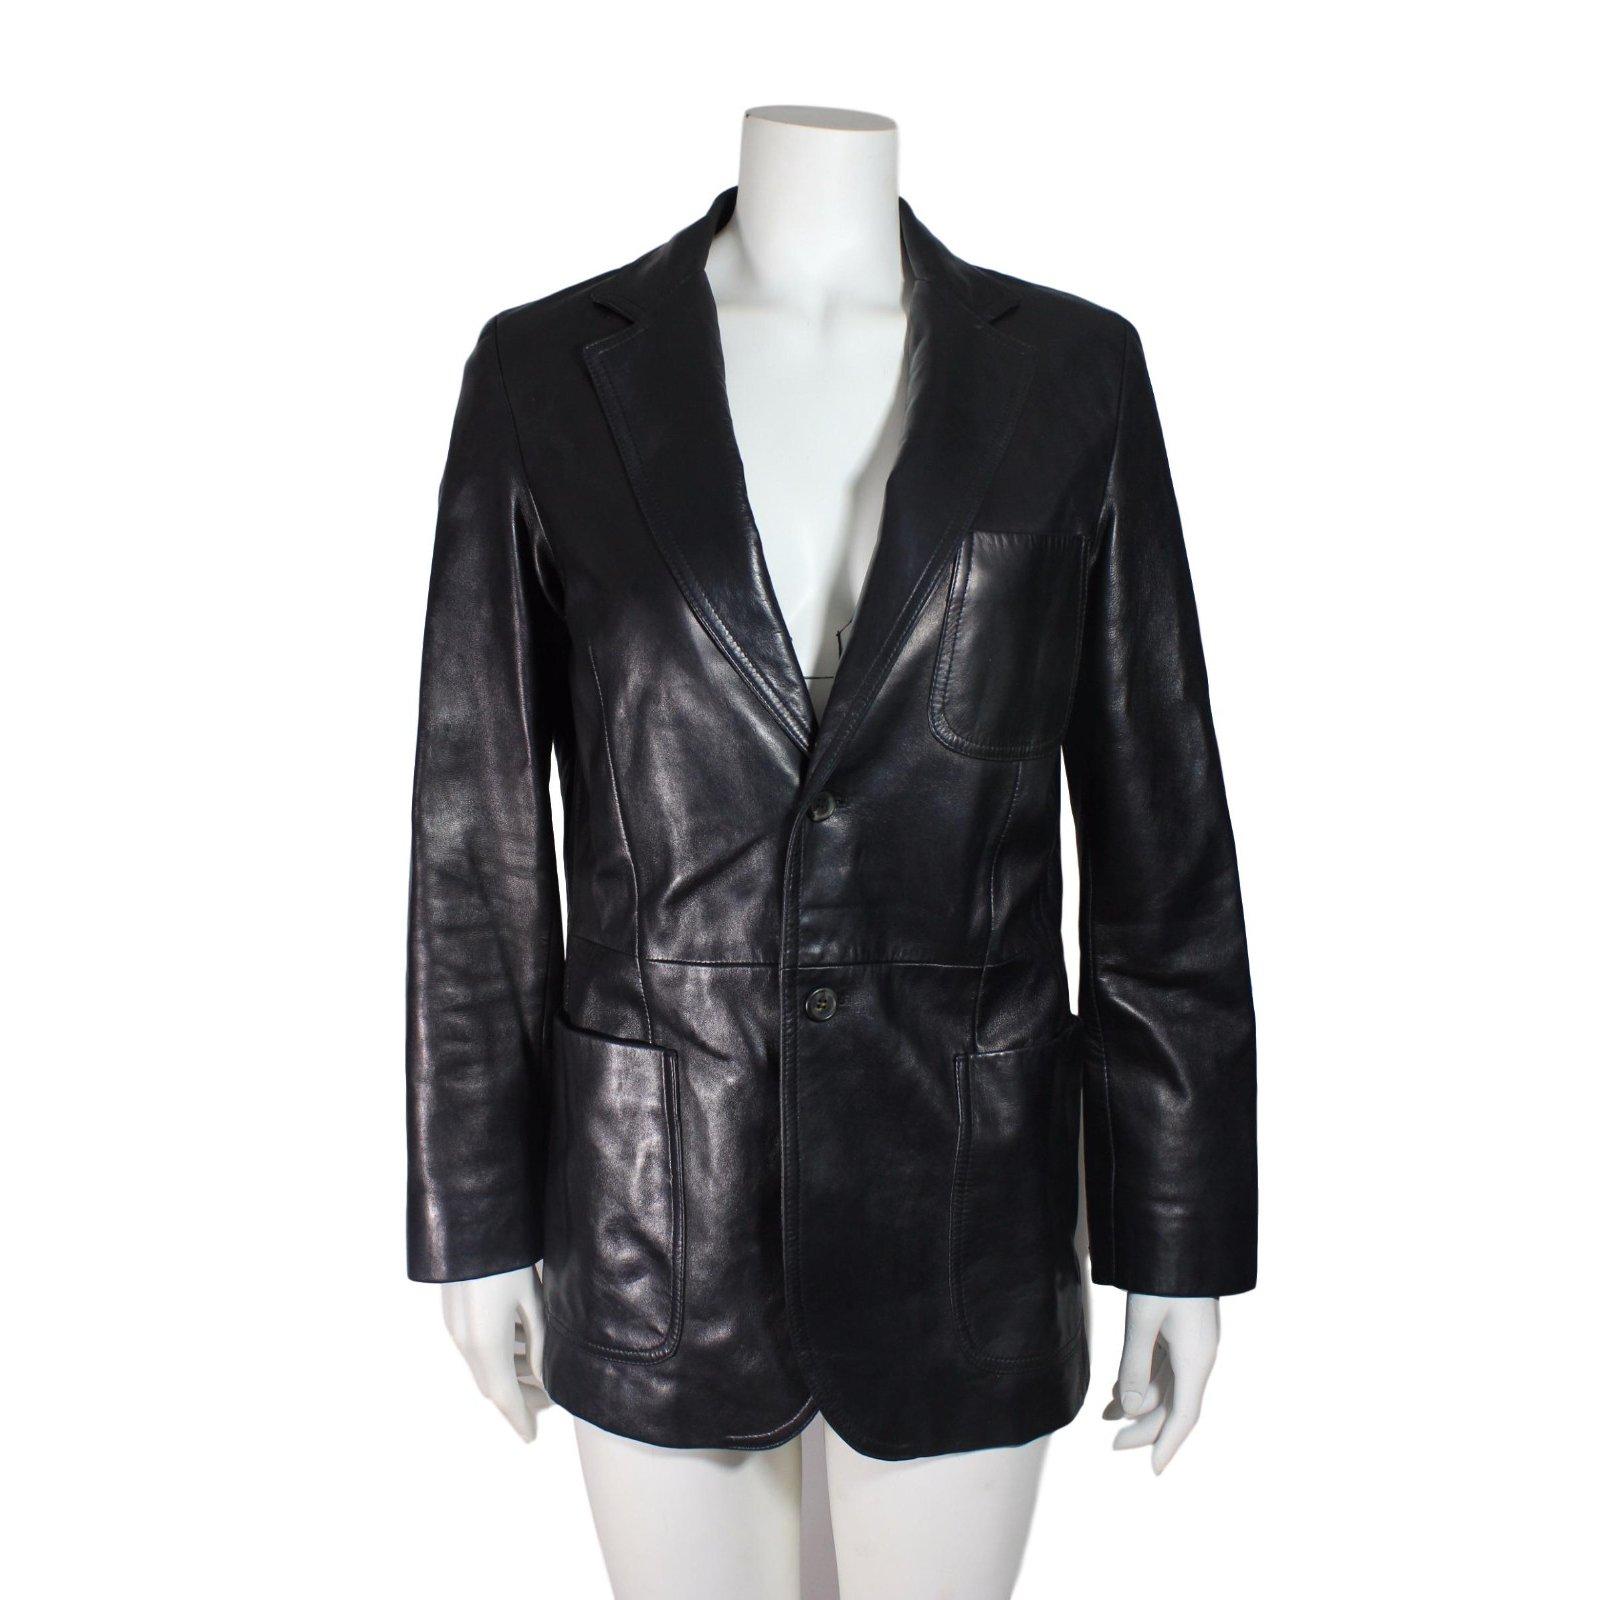 vestes prada veste en cuir cuir noir joli closet. Black Bedroom Furniture Sets. Home Design Ideas